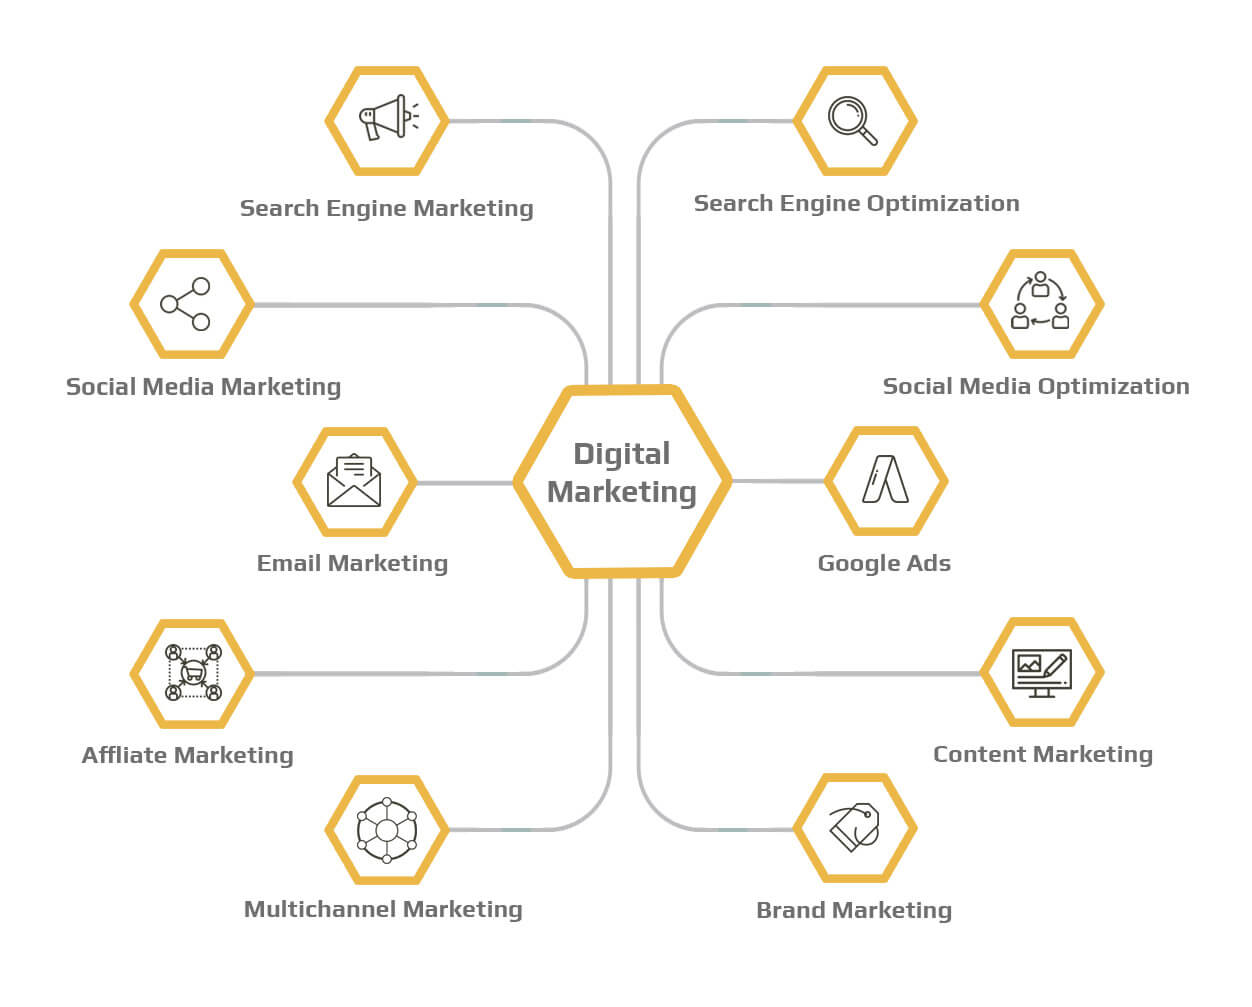 Best digital marketing agency in Chennai | Organic SEO & PPC